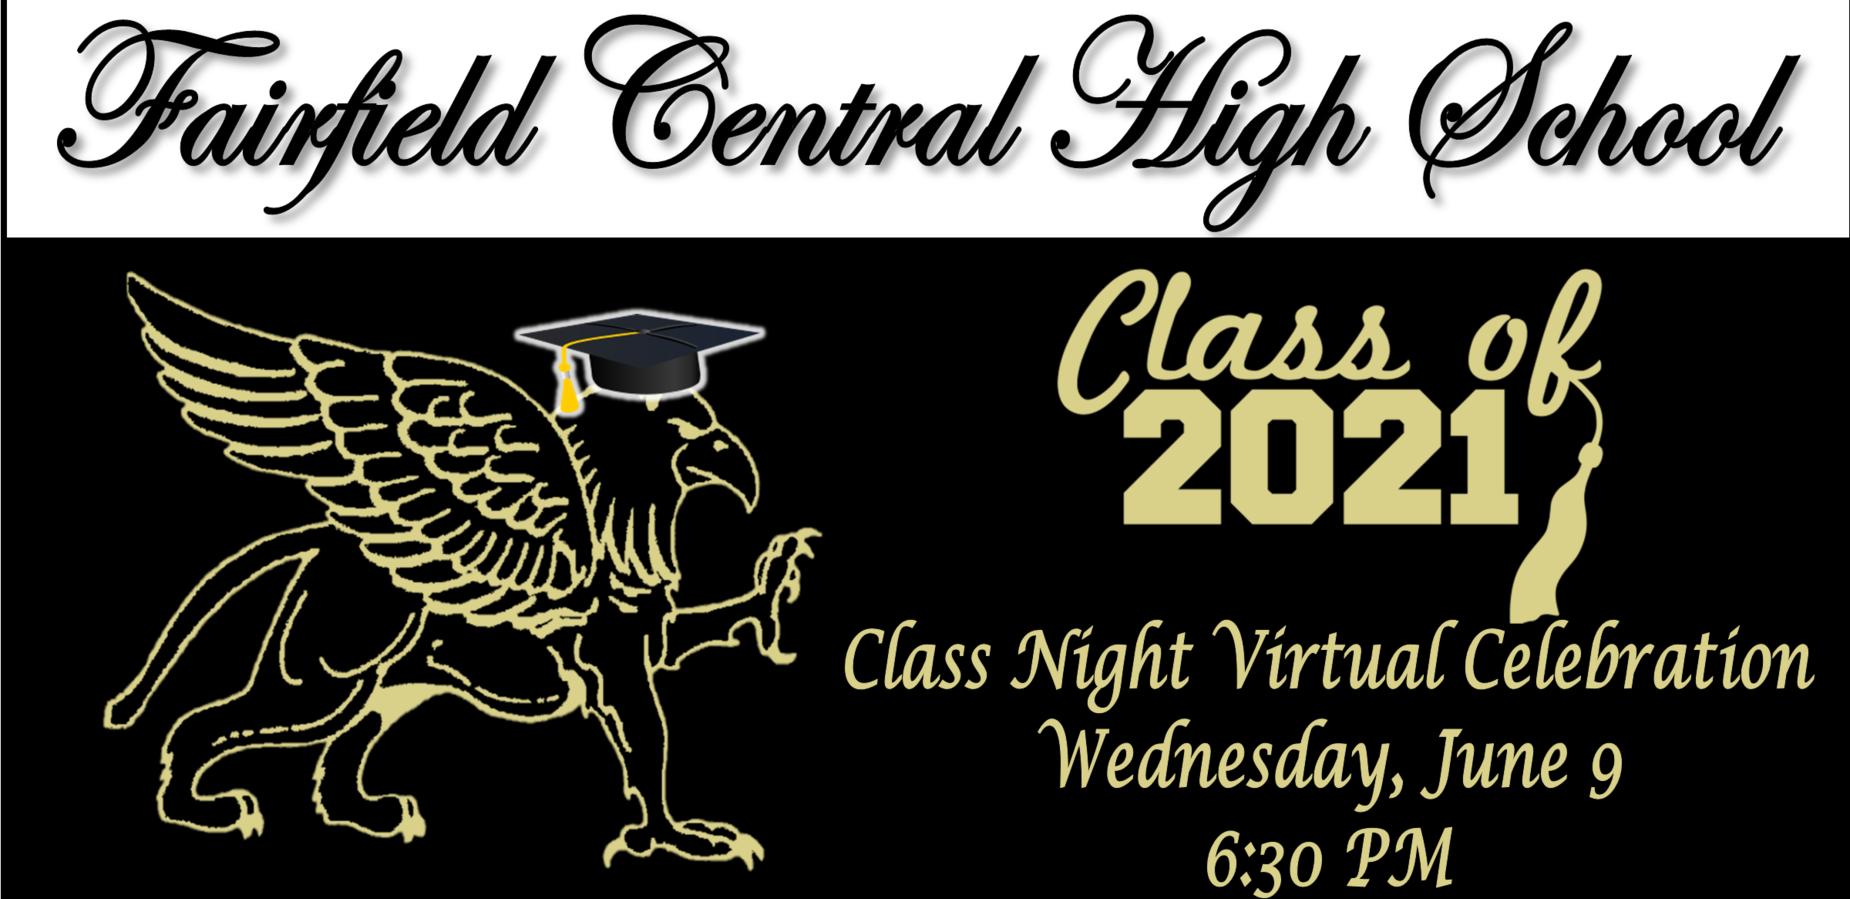 FCHS class night virtual celebration Wednesday, June 9 6:30 PM